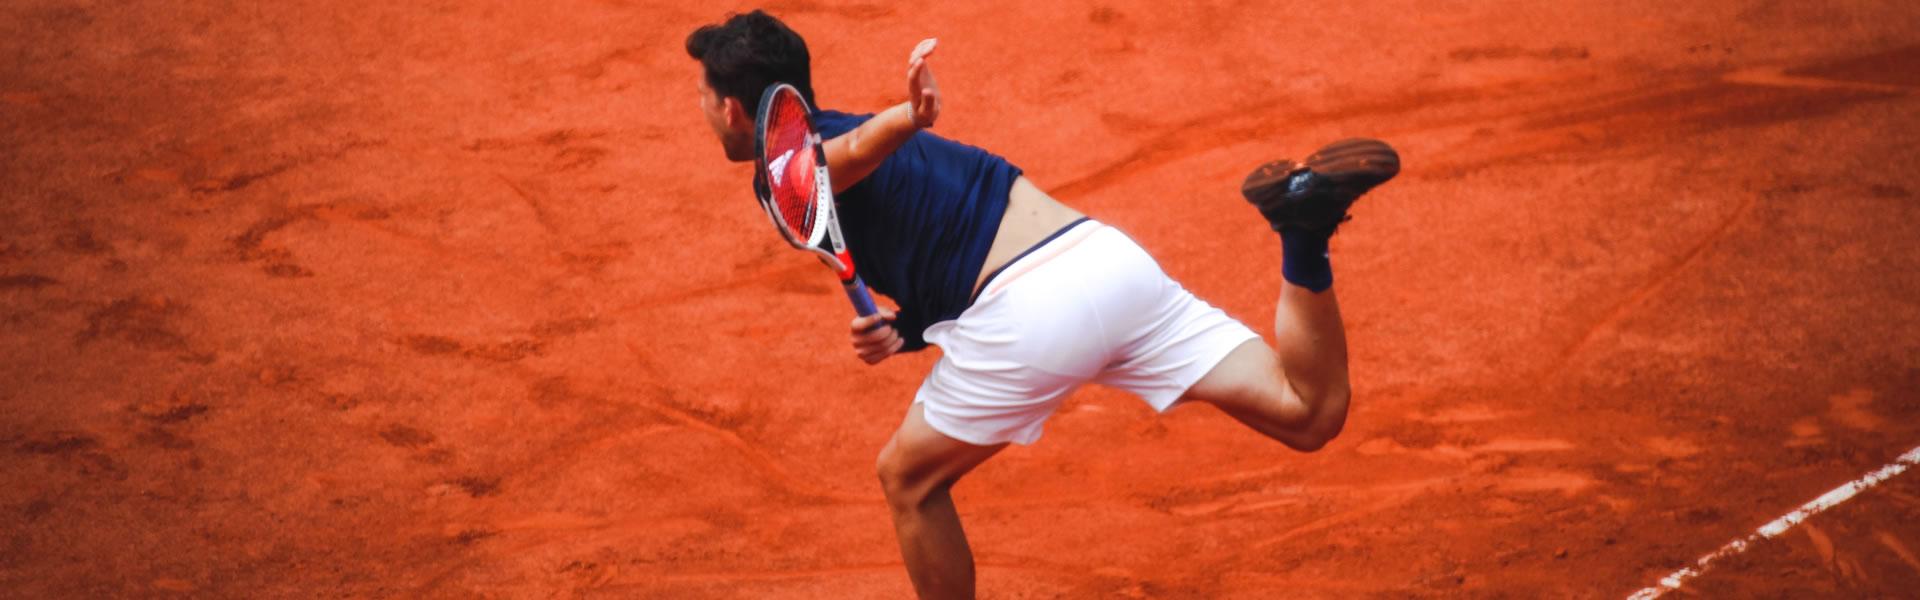 Deporte Tenis